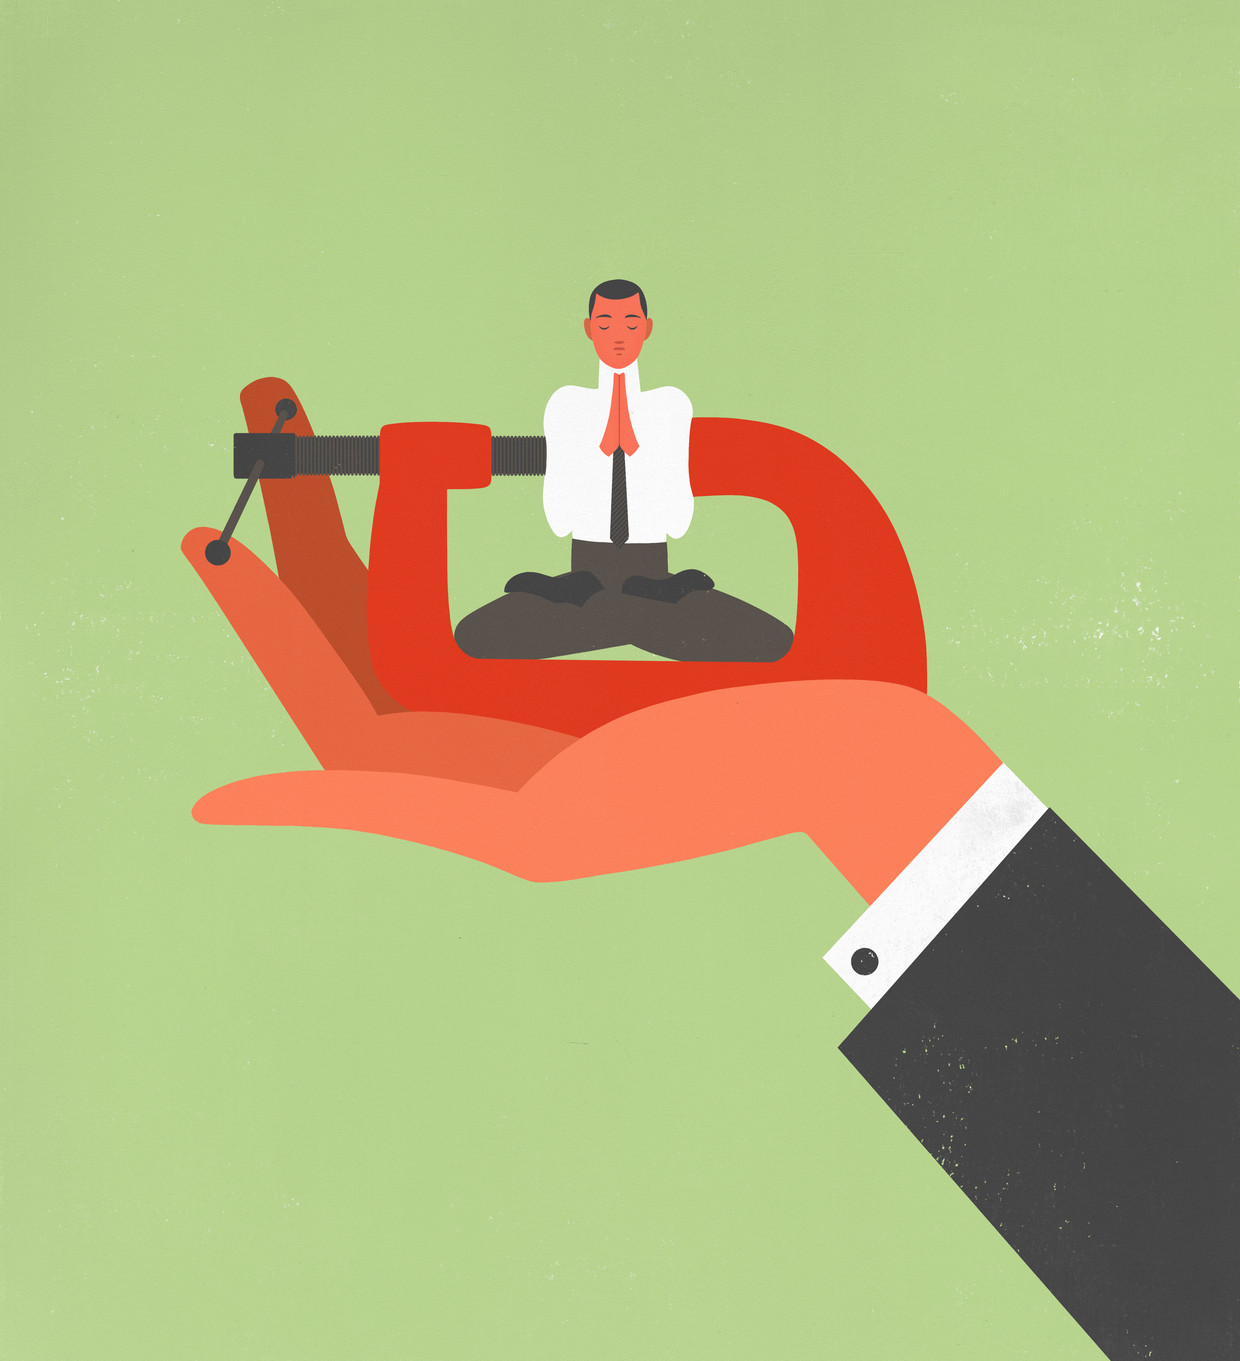 Volgens hoogleraar management Ronald Purser is mindfulness een neoliberale ontspanningsmethode die mensen passief en gedwee maakt. Beeld Jon Krause